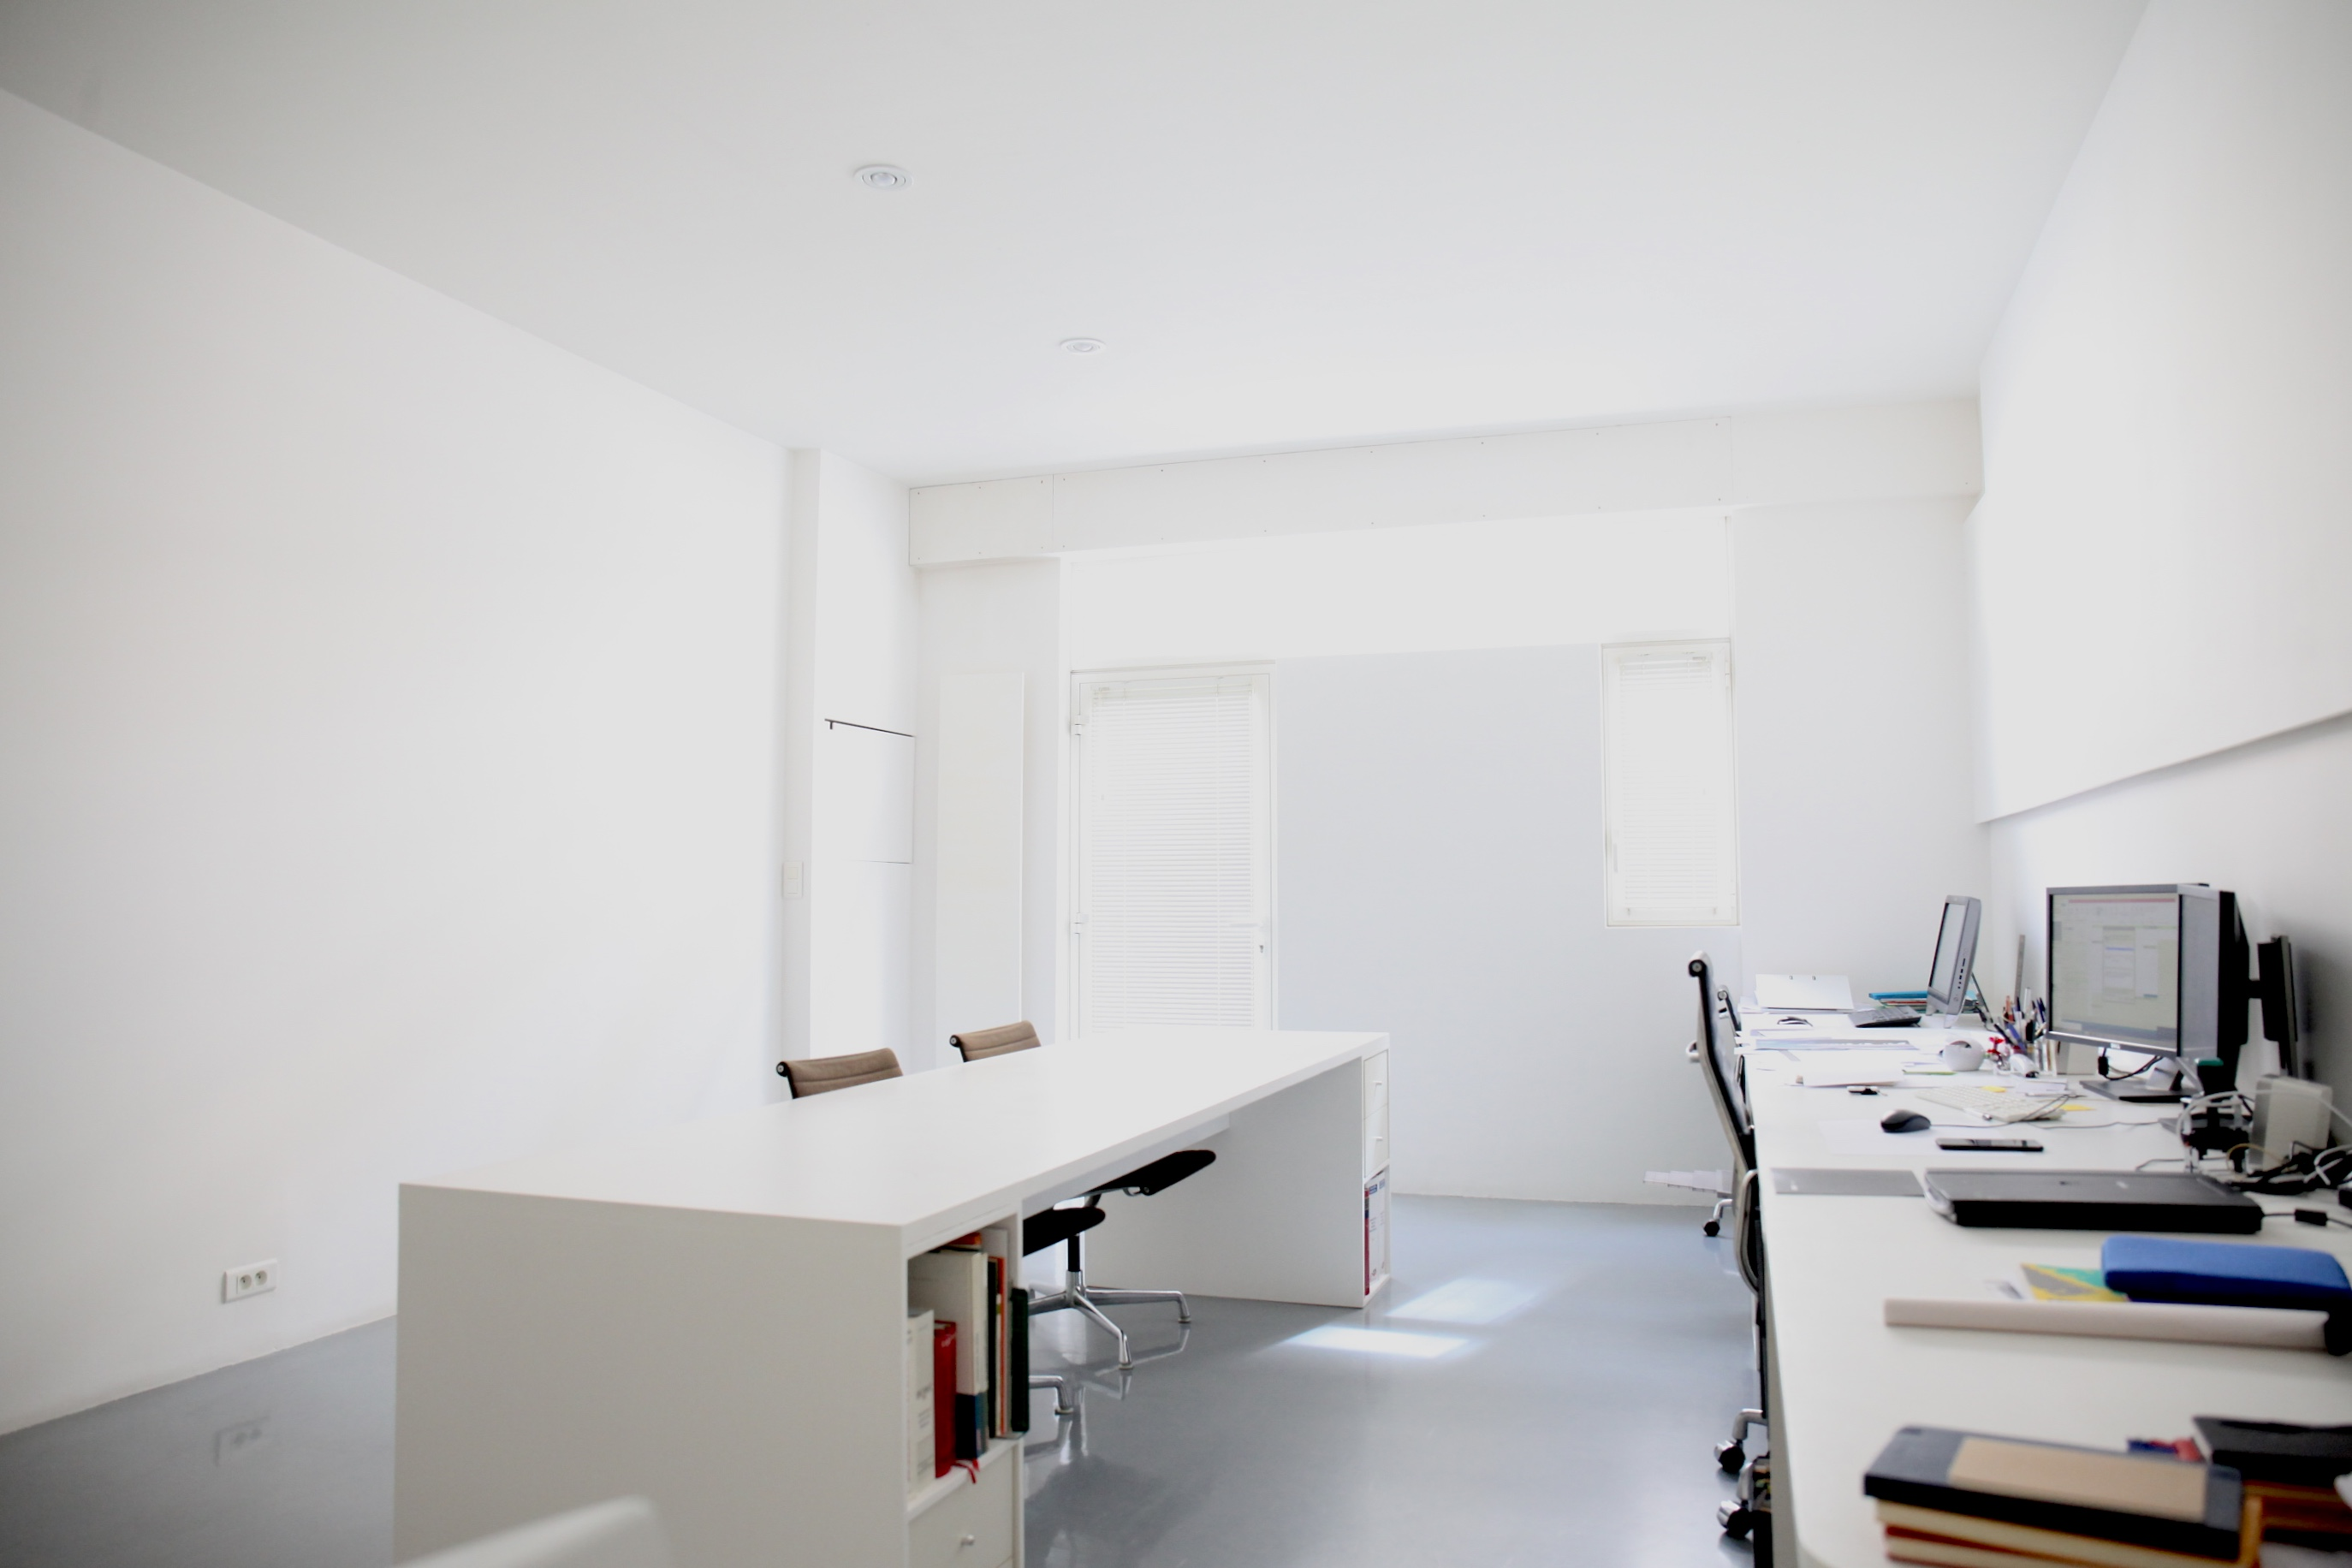 5e - Camas - Loft - Atelier architecte - 199 000€